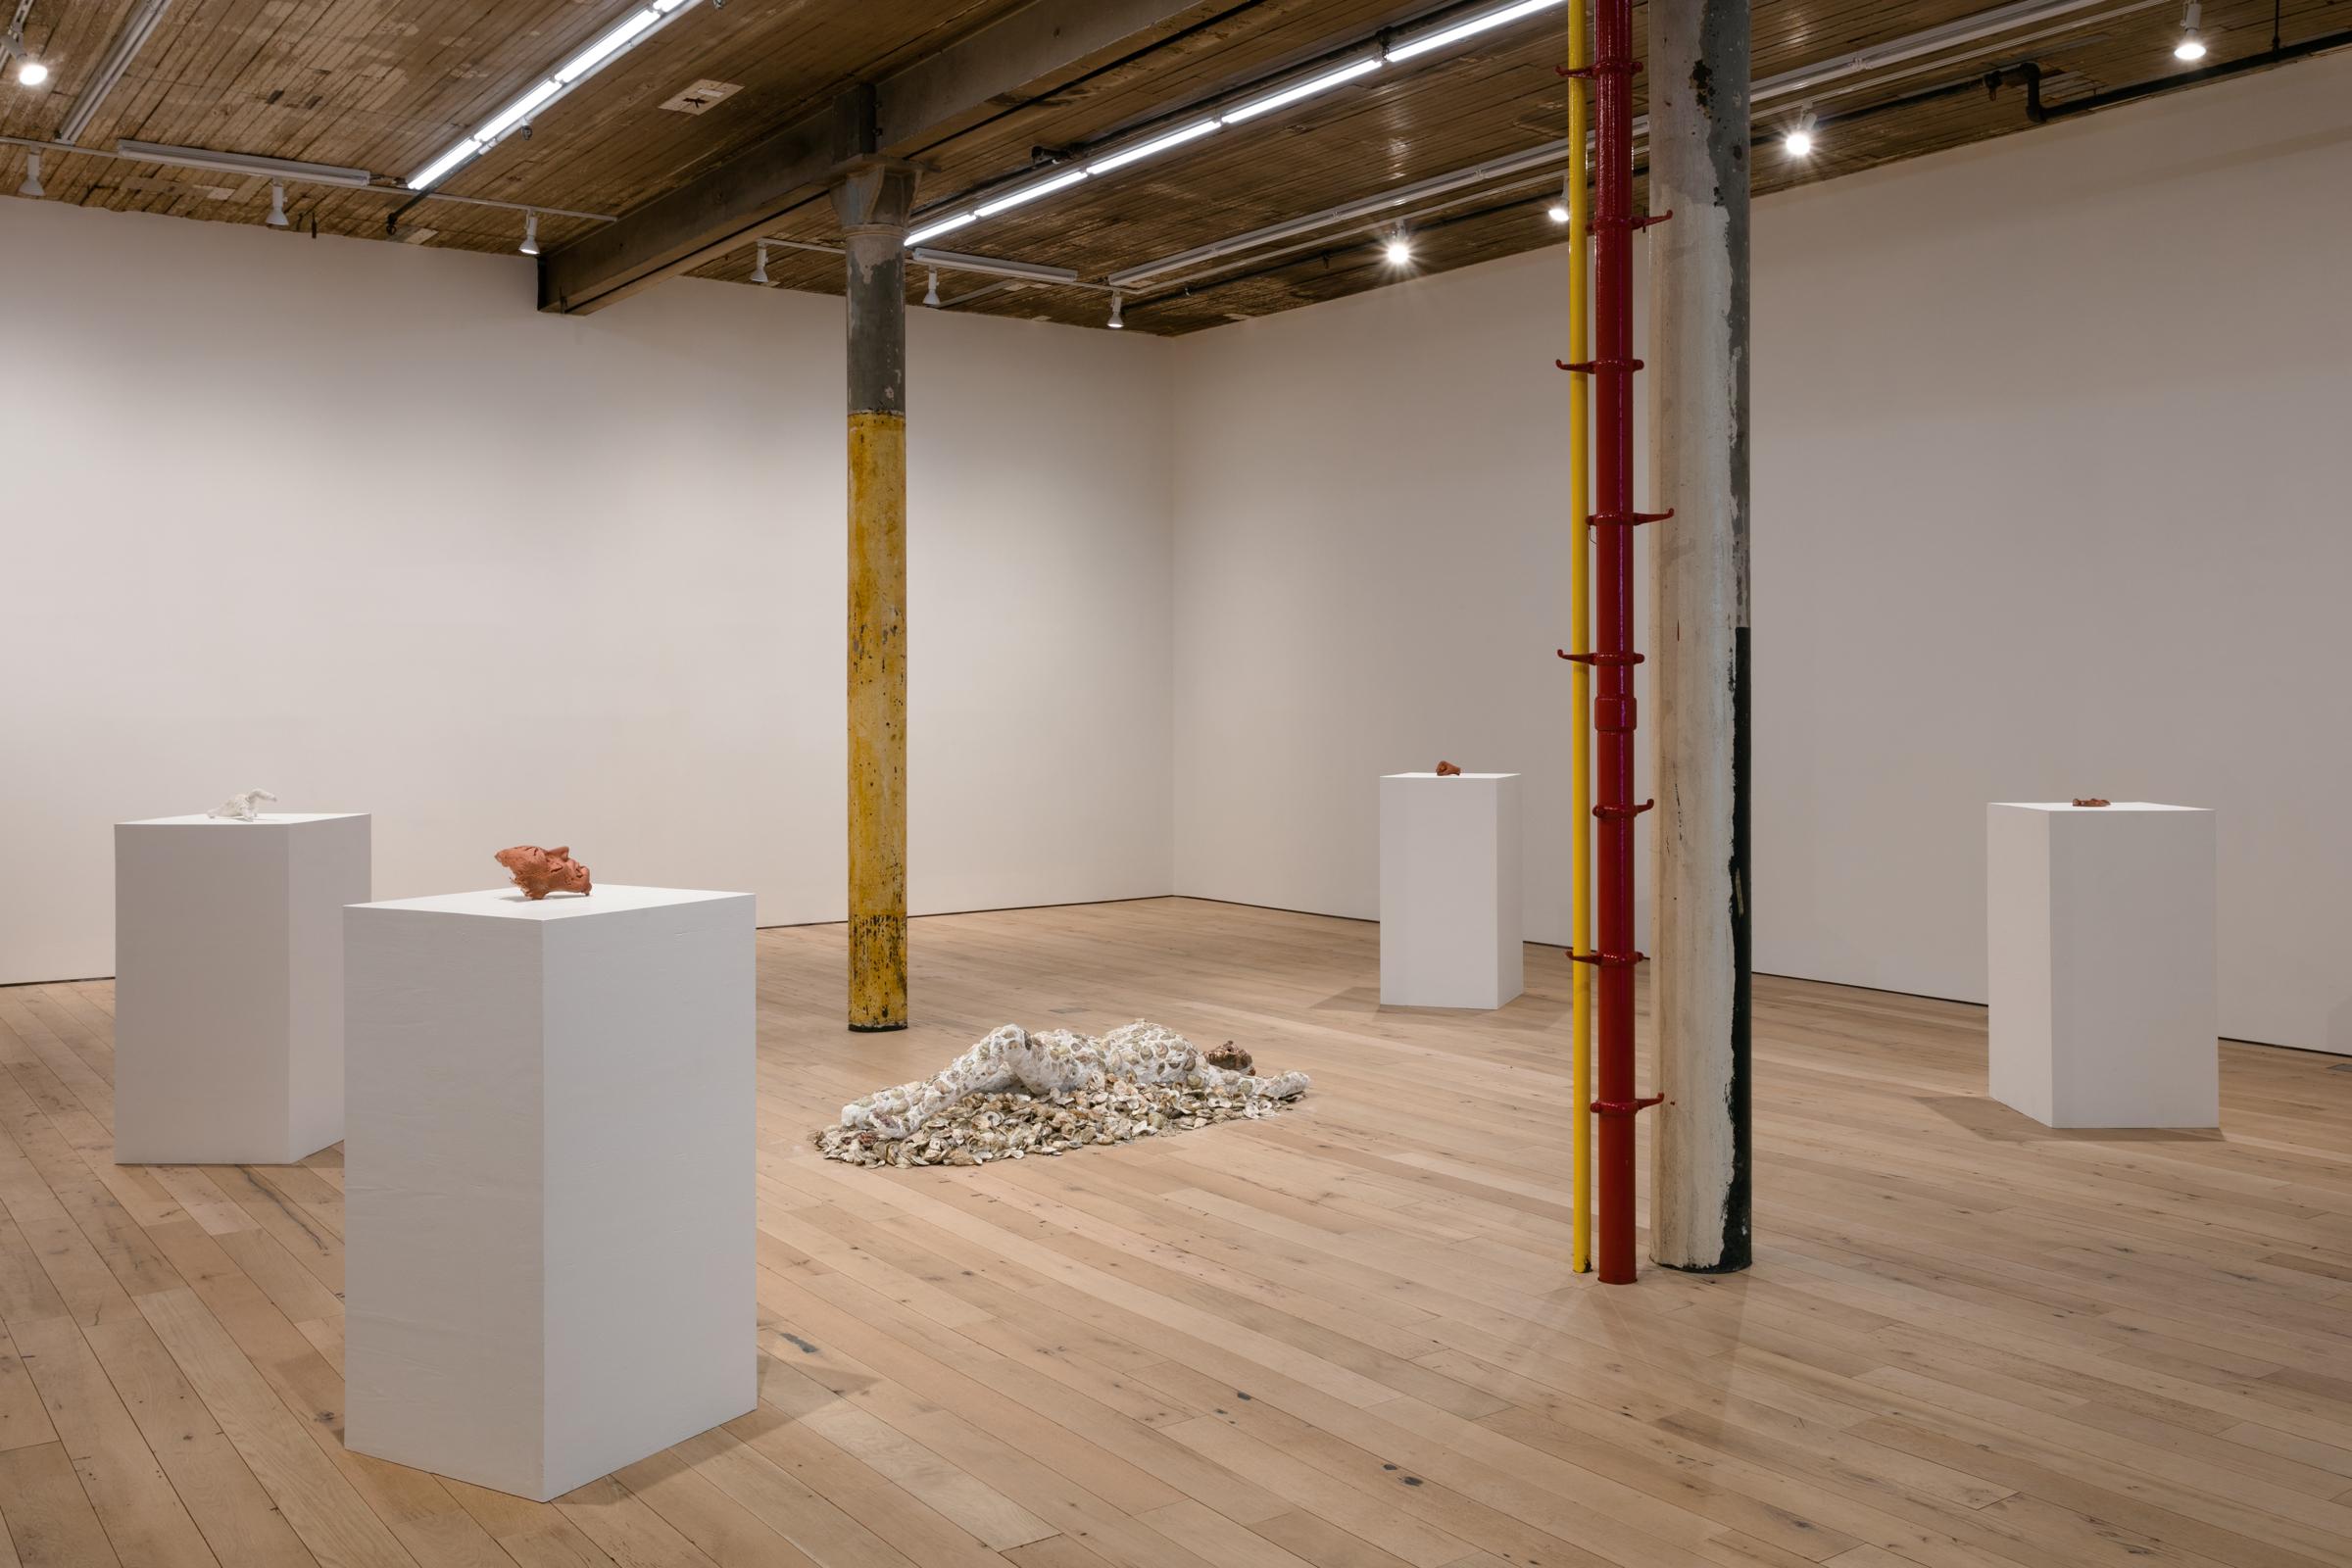 Installation view, oikos love love love, Martos Gallery, New York, 2018